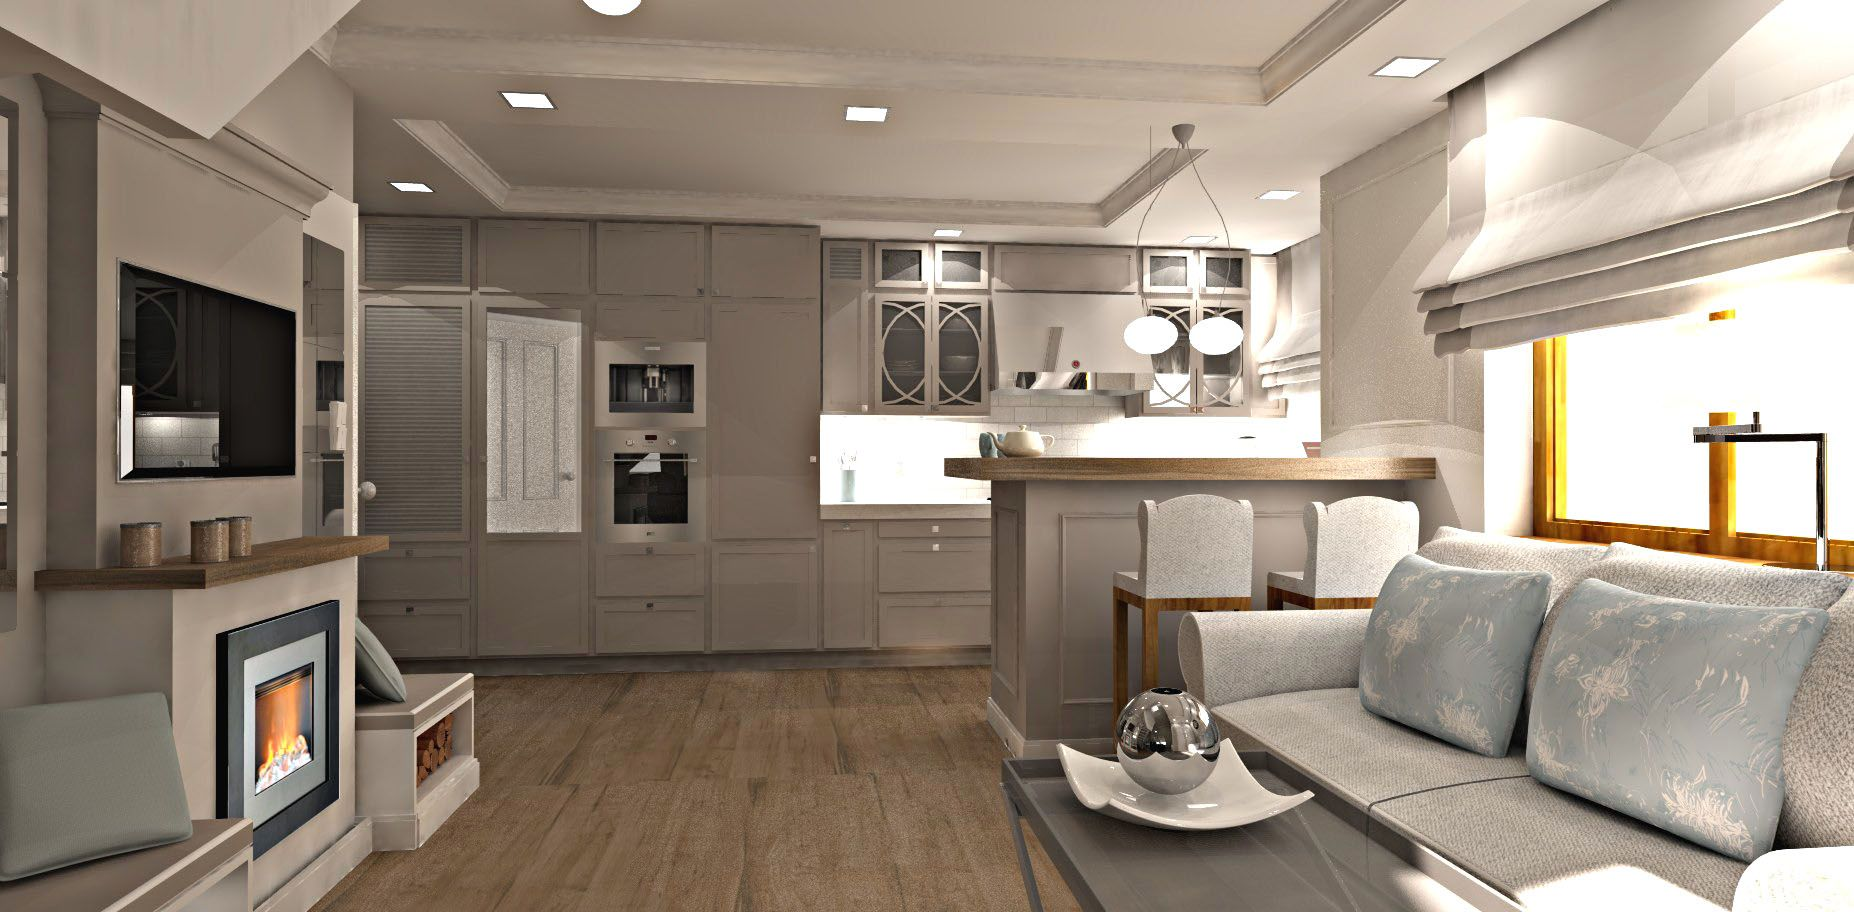 Waski Salon Z Aneksem Kuchennym Szukaj W Google Home Home Decor Decor